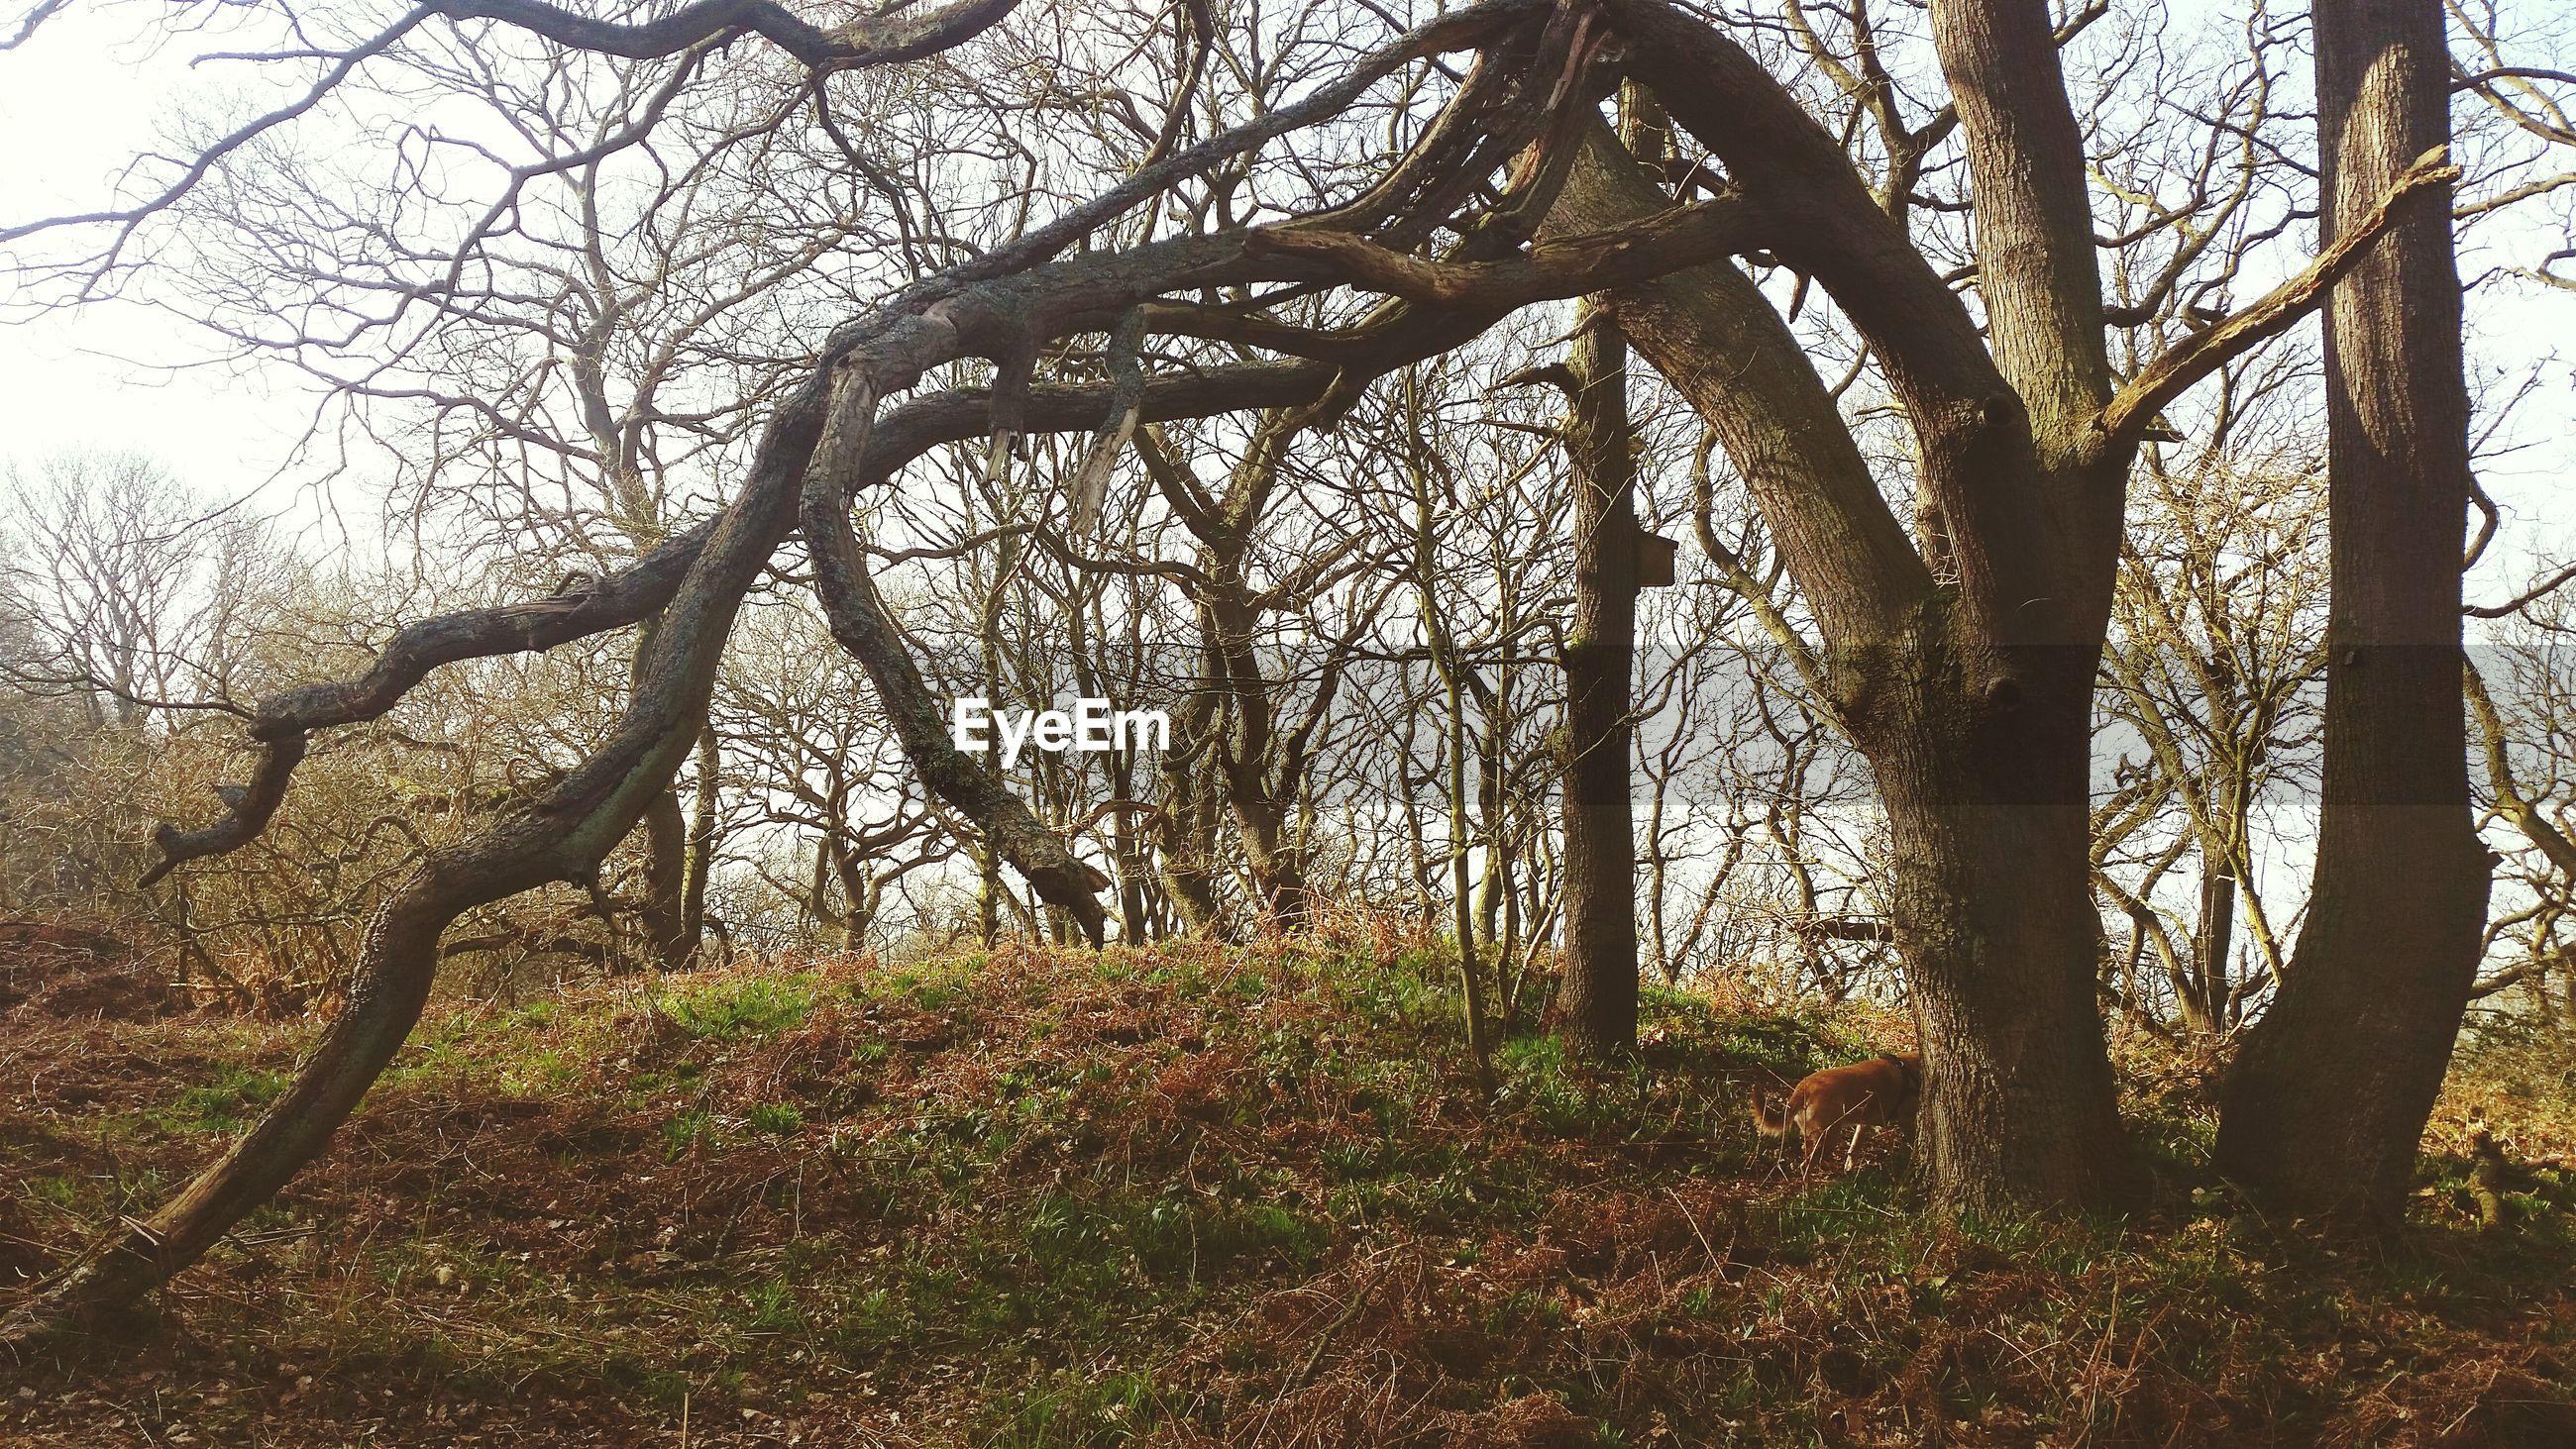 Twisted bare tree